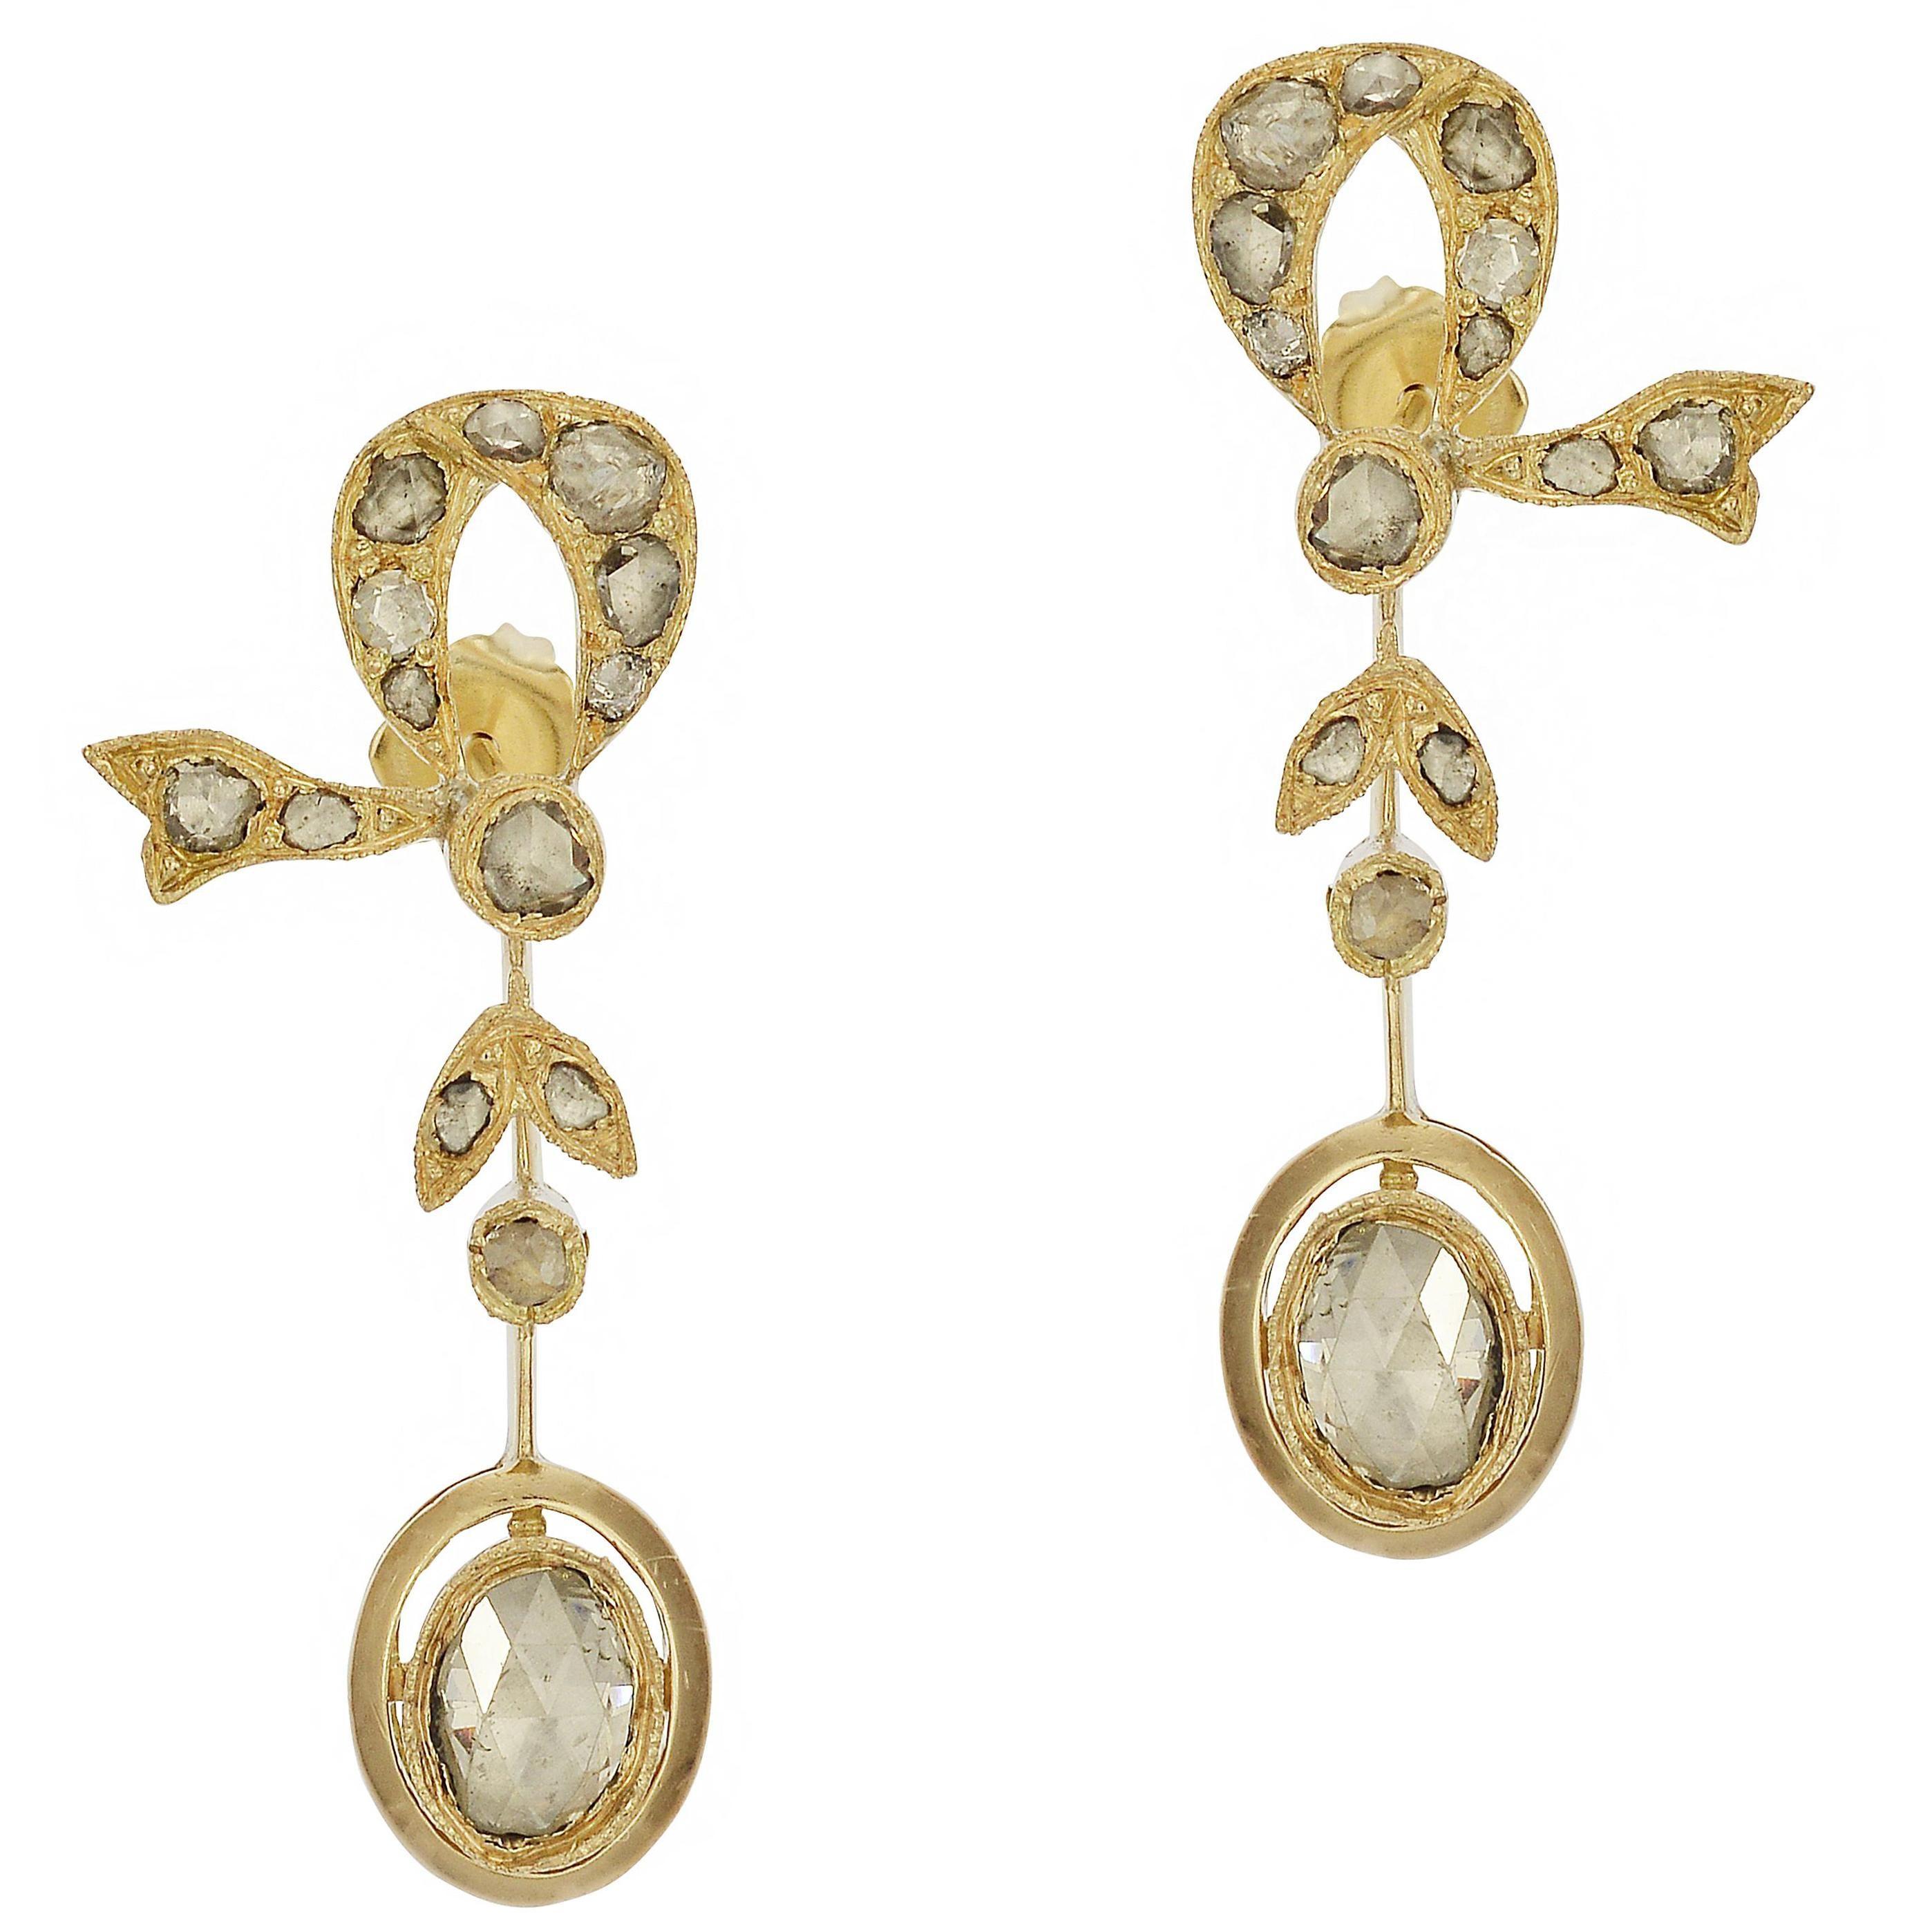 2.00 Carat Antique Rose Cut Diamond Bow Earrings